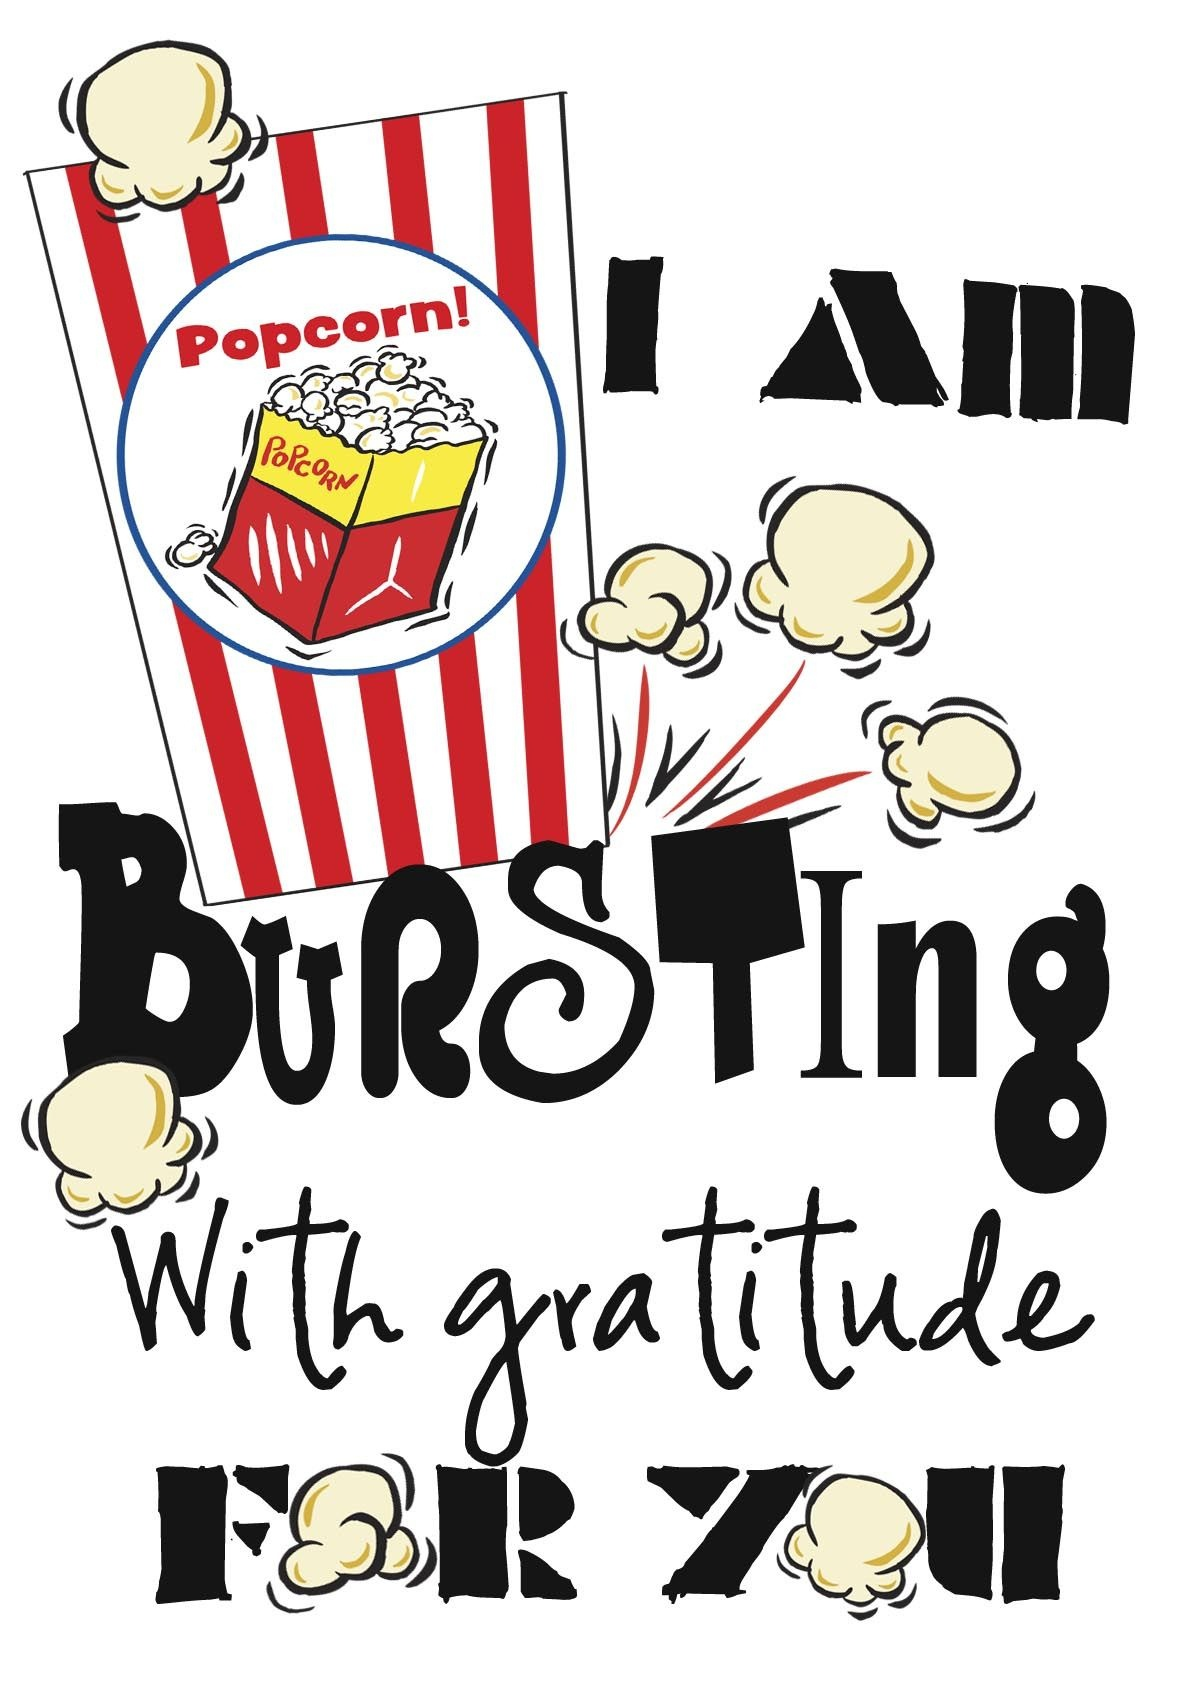 Pinamy Knight On Craft Ideas | Volunteer Appreciation Gifts - Free Popcorn Teacher Appreciation Printable